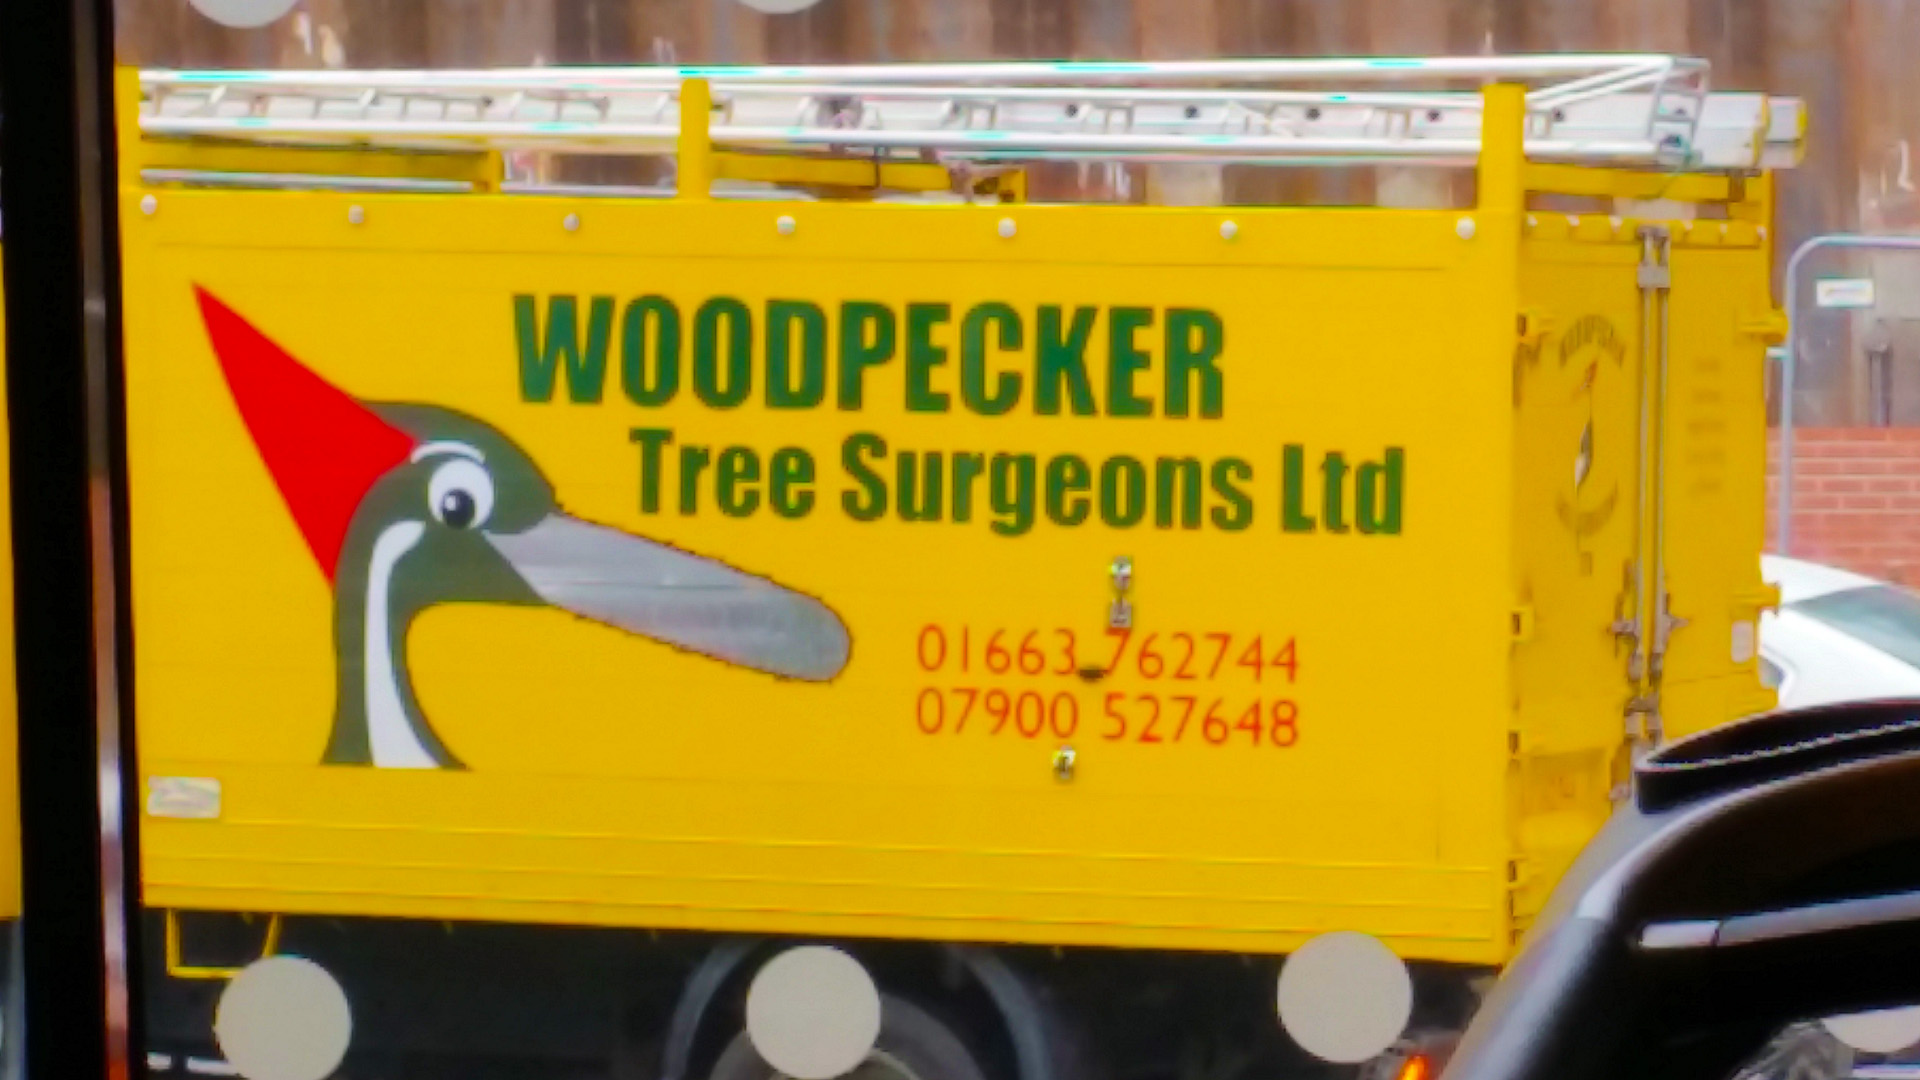 Woodpecker Tree Surgeons